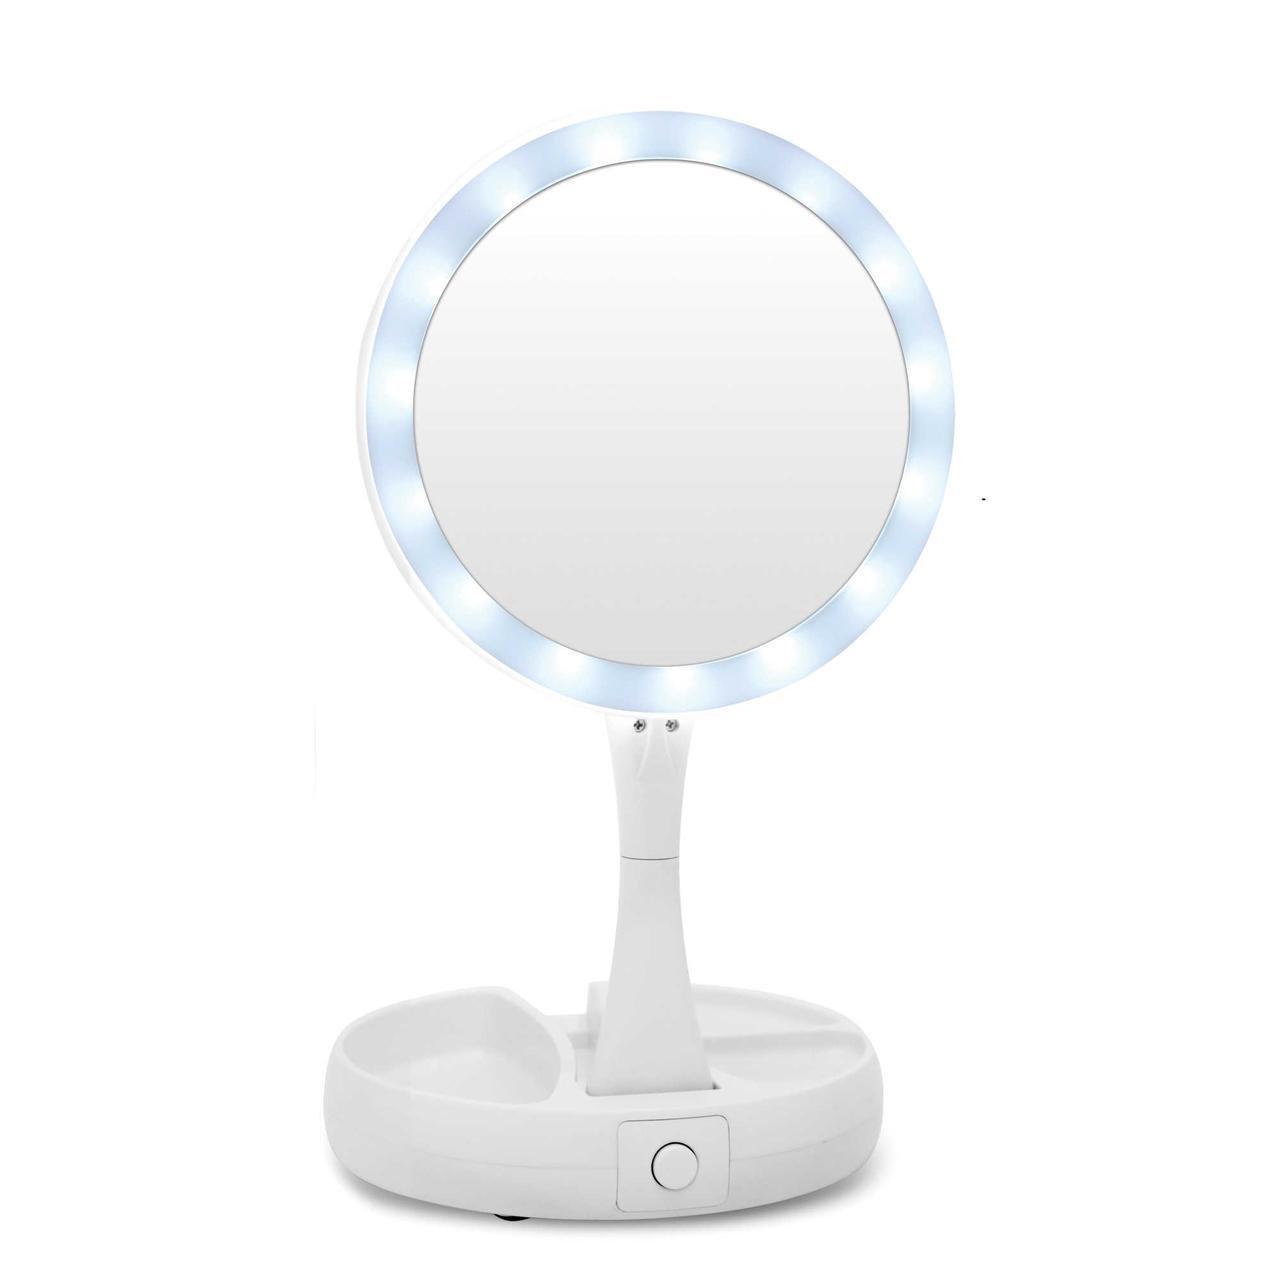 Зеркало для макияжа с LED подсветкой  MakeUp Mirror (15 светодиодов), фото 1